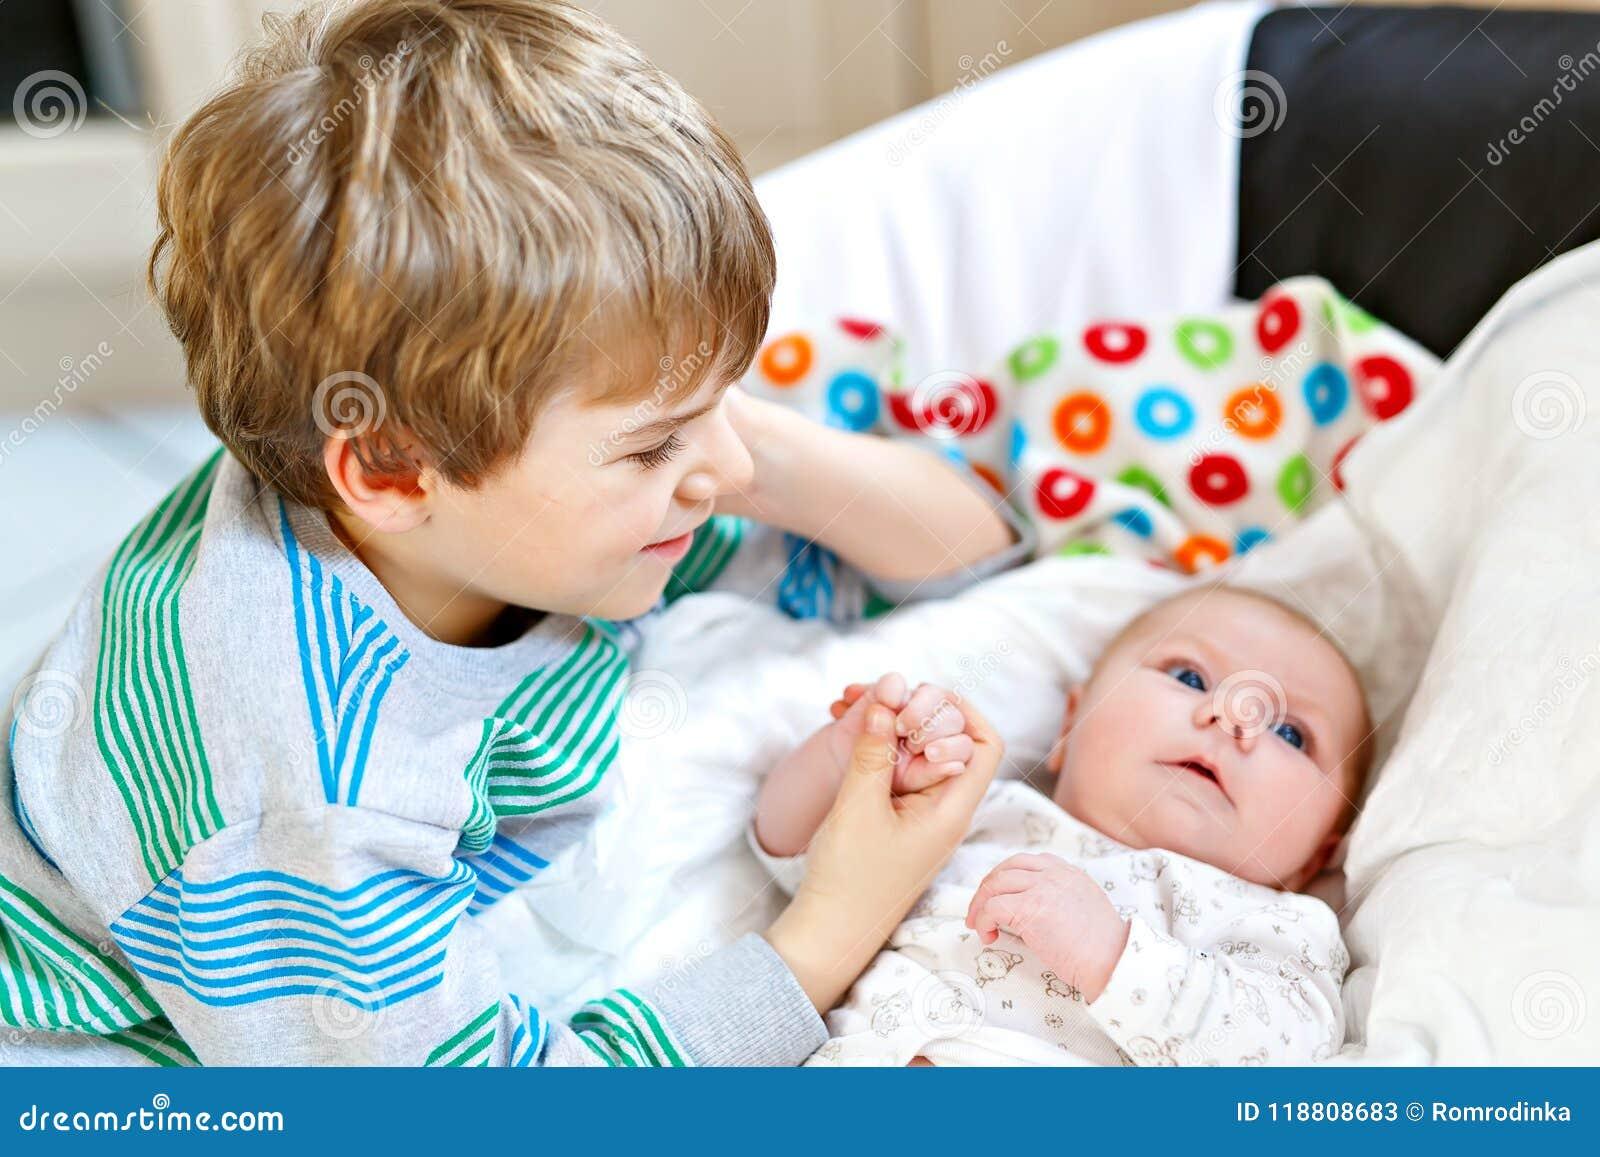 79cb5328e3223 Happy Little Kid Boy With Newborn Baby Sister Girl Stock Image ...